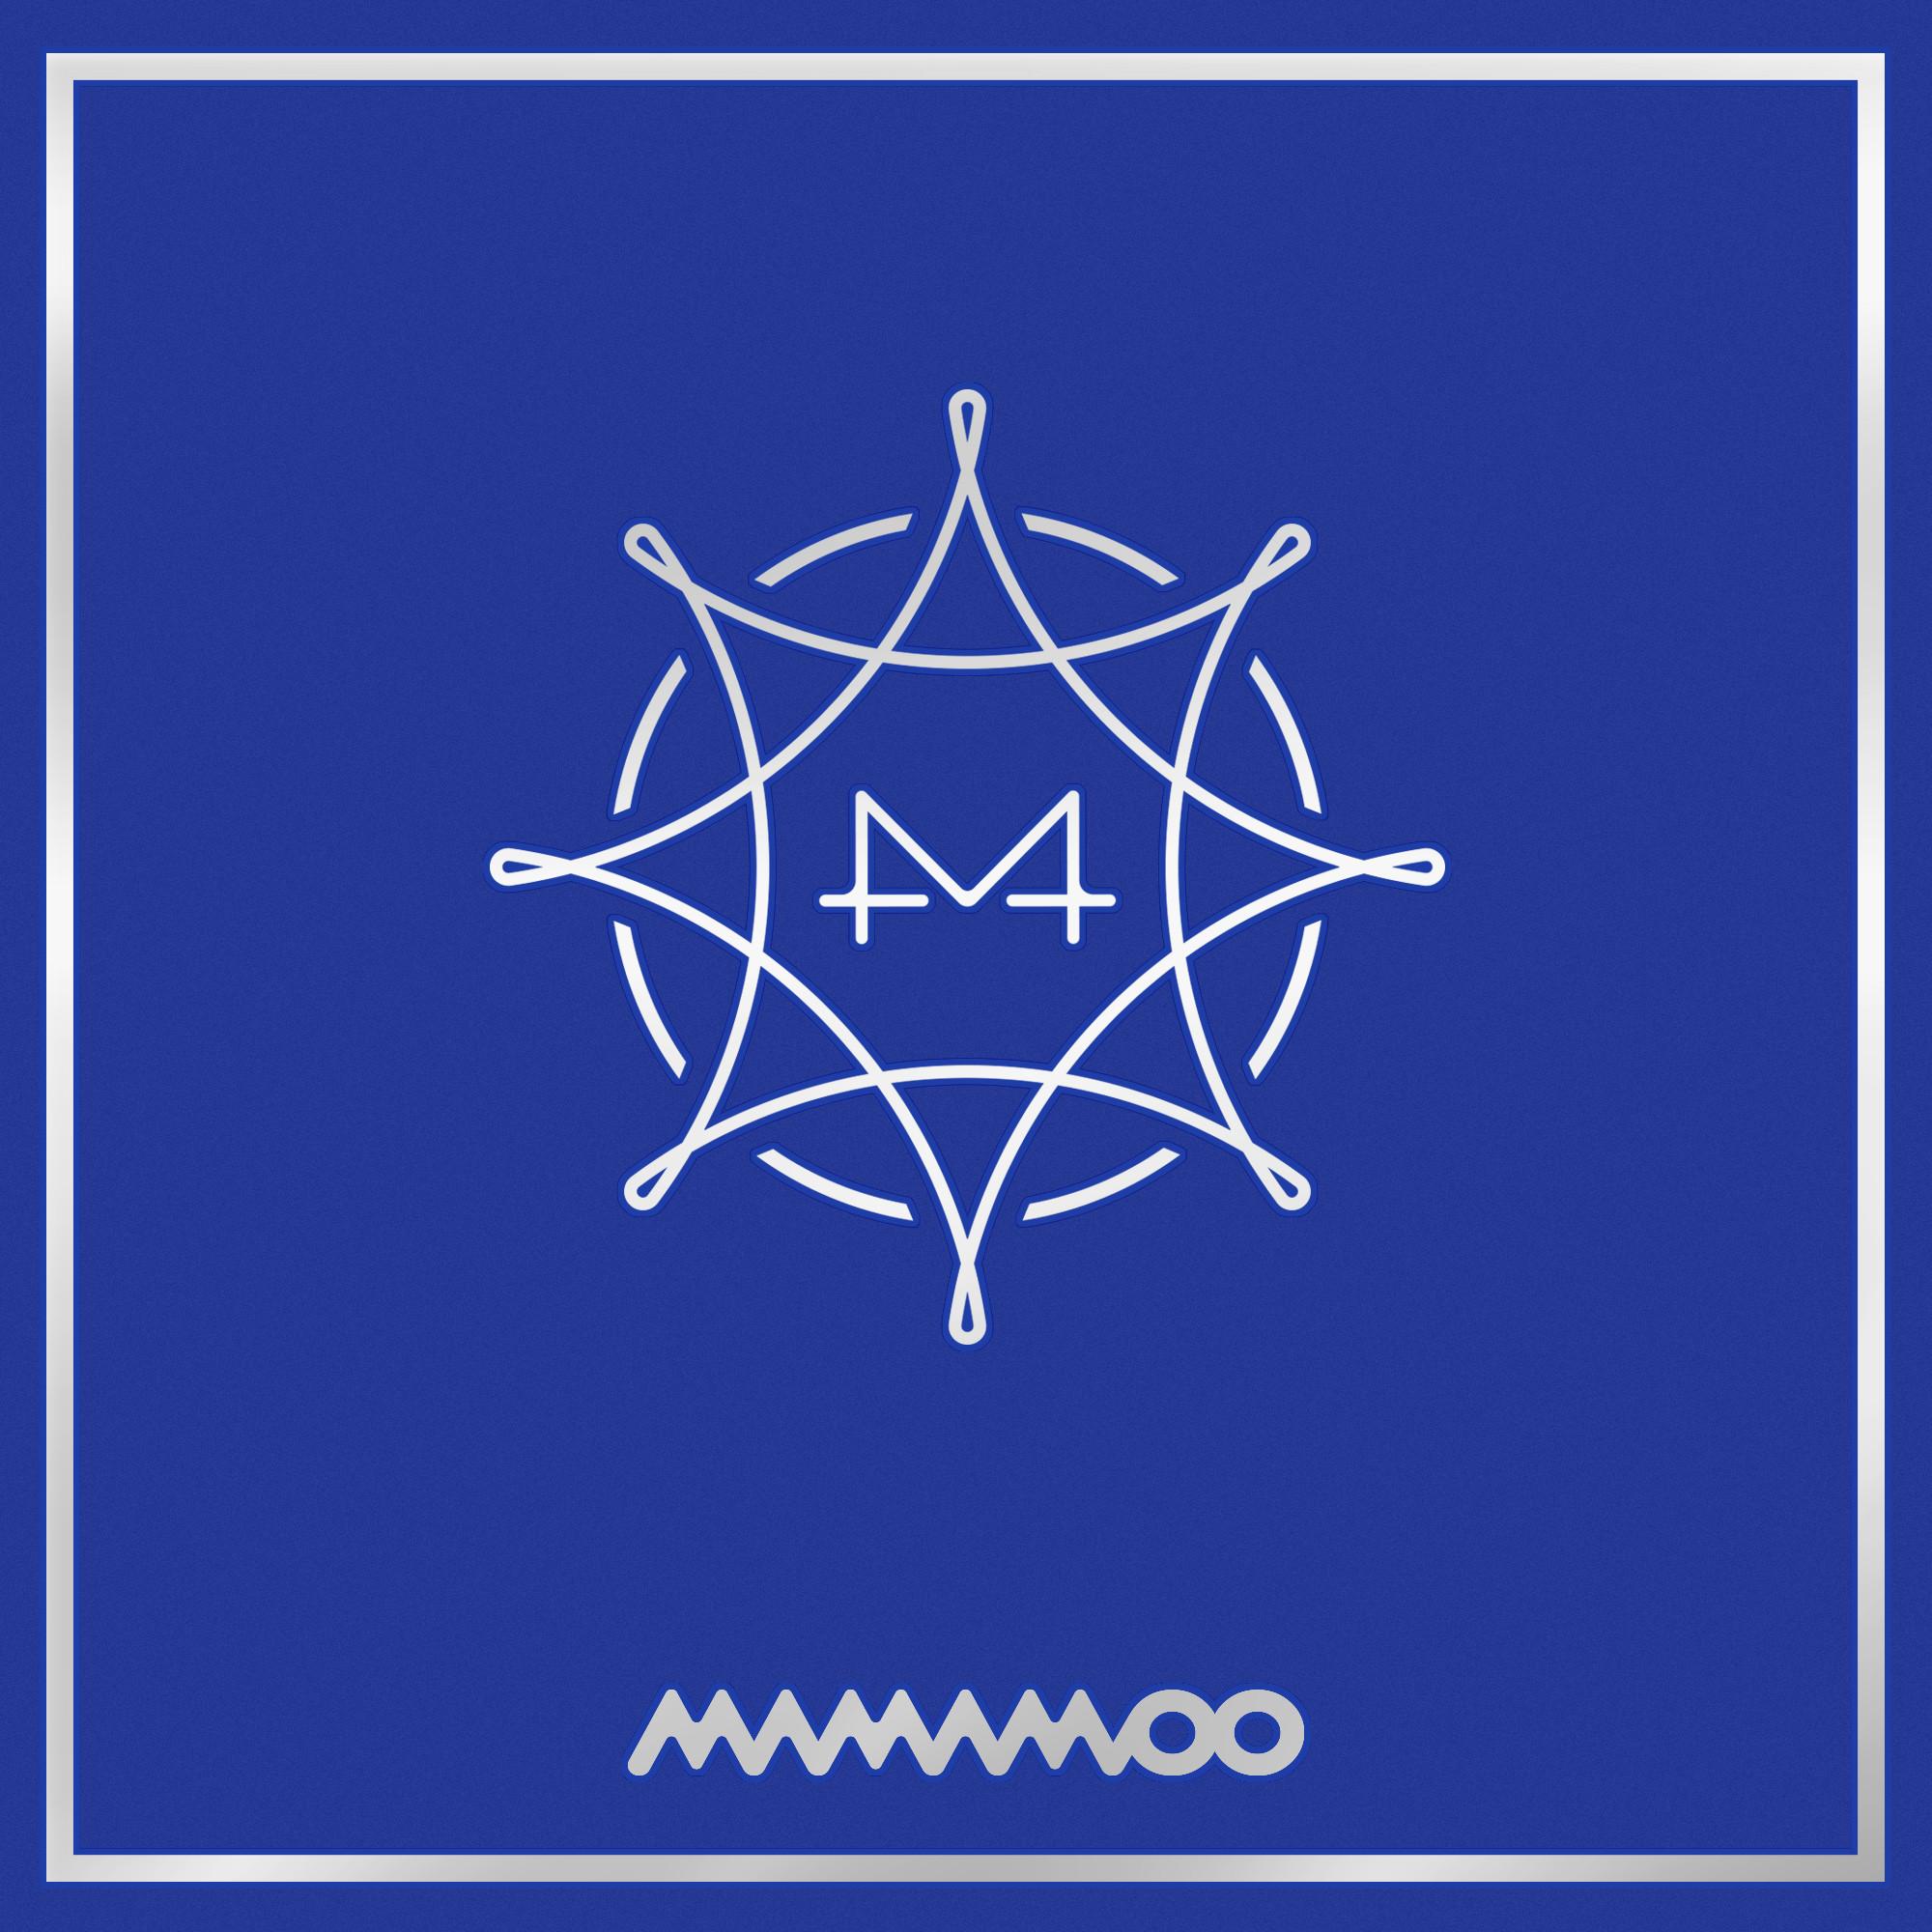 [MAMAMOO] BLUE;S